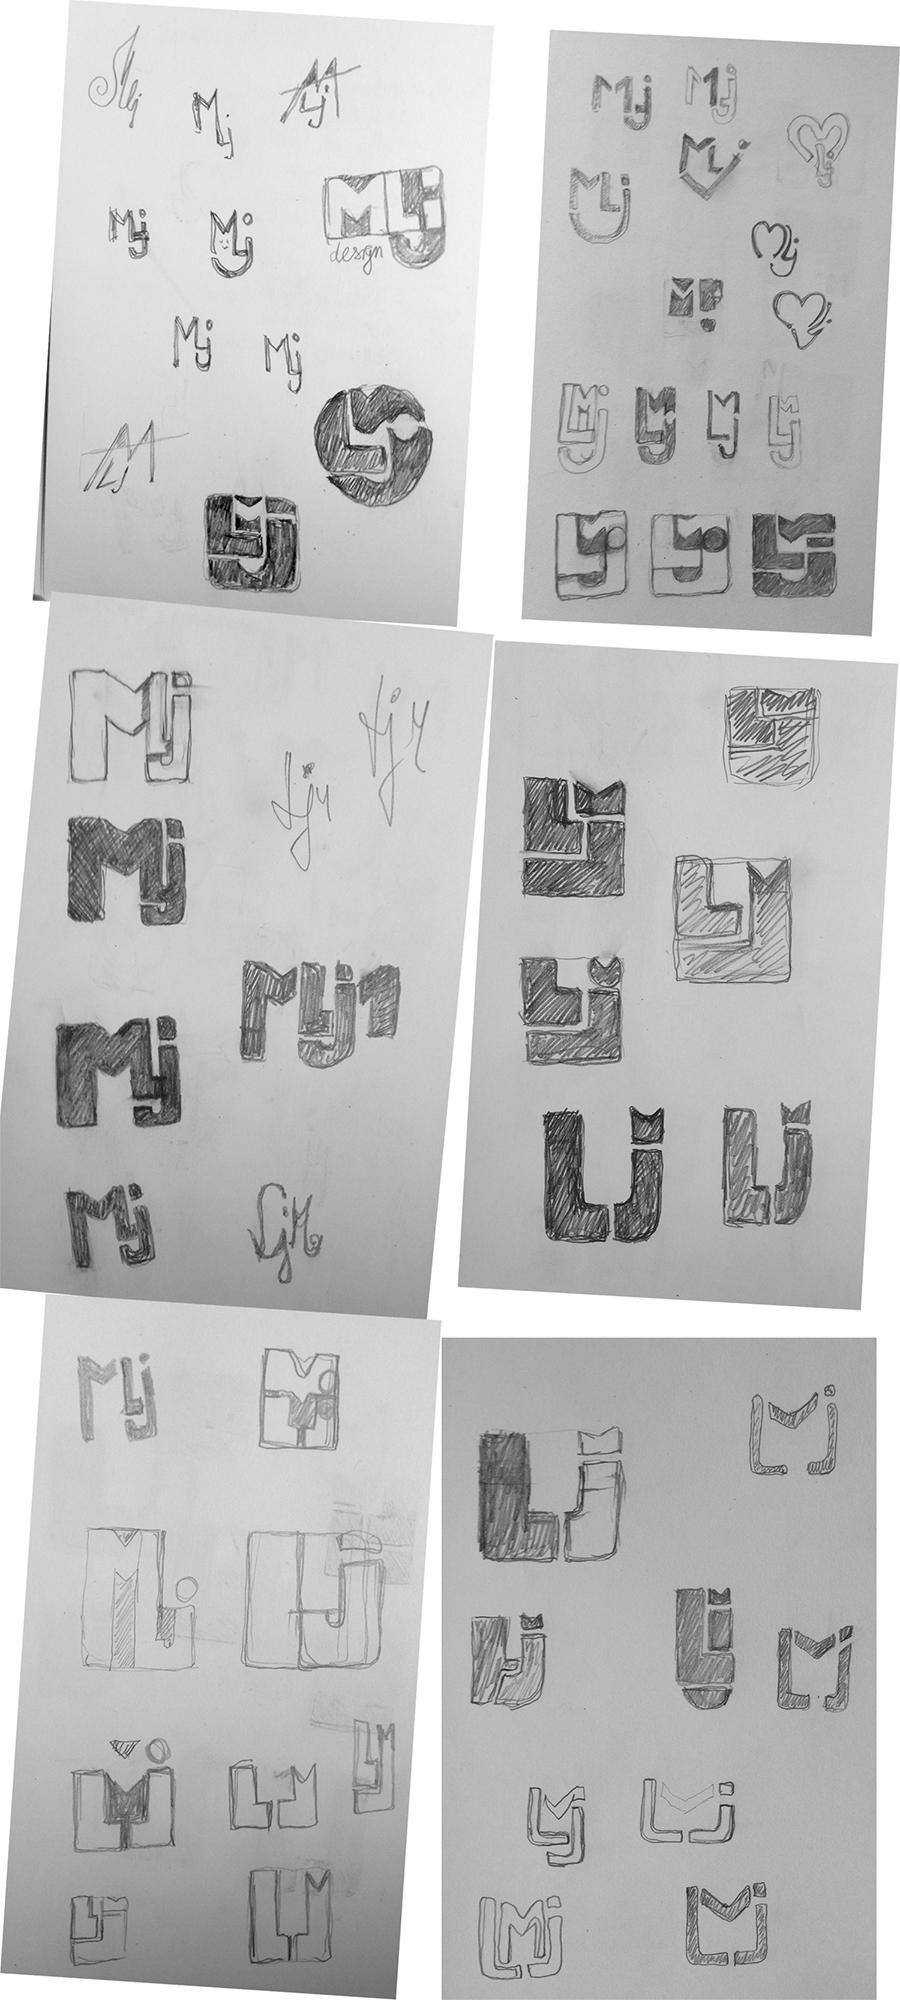 M Lj - image 1 - student project